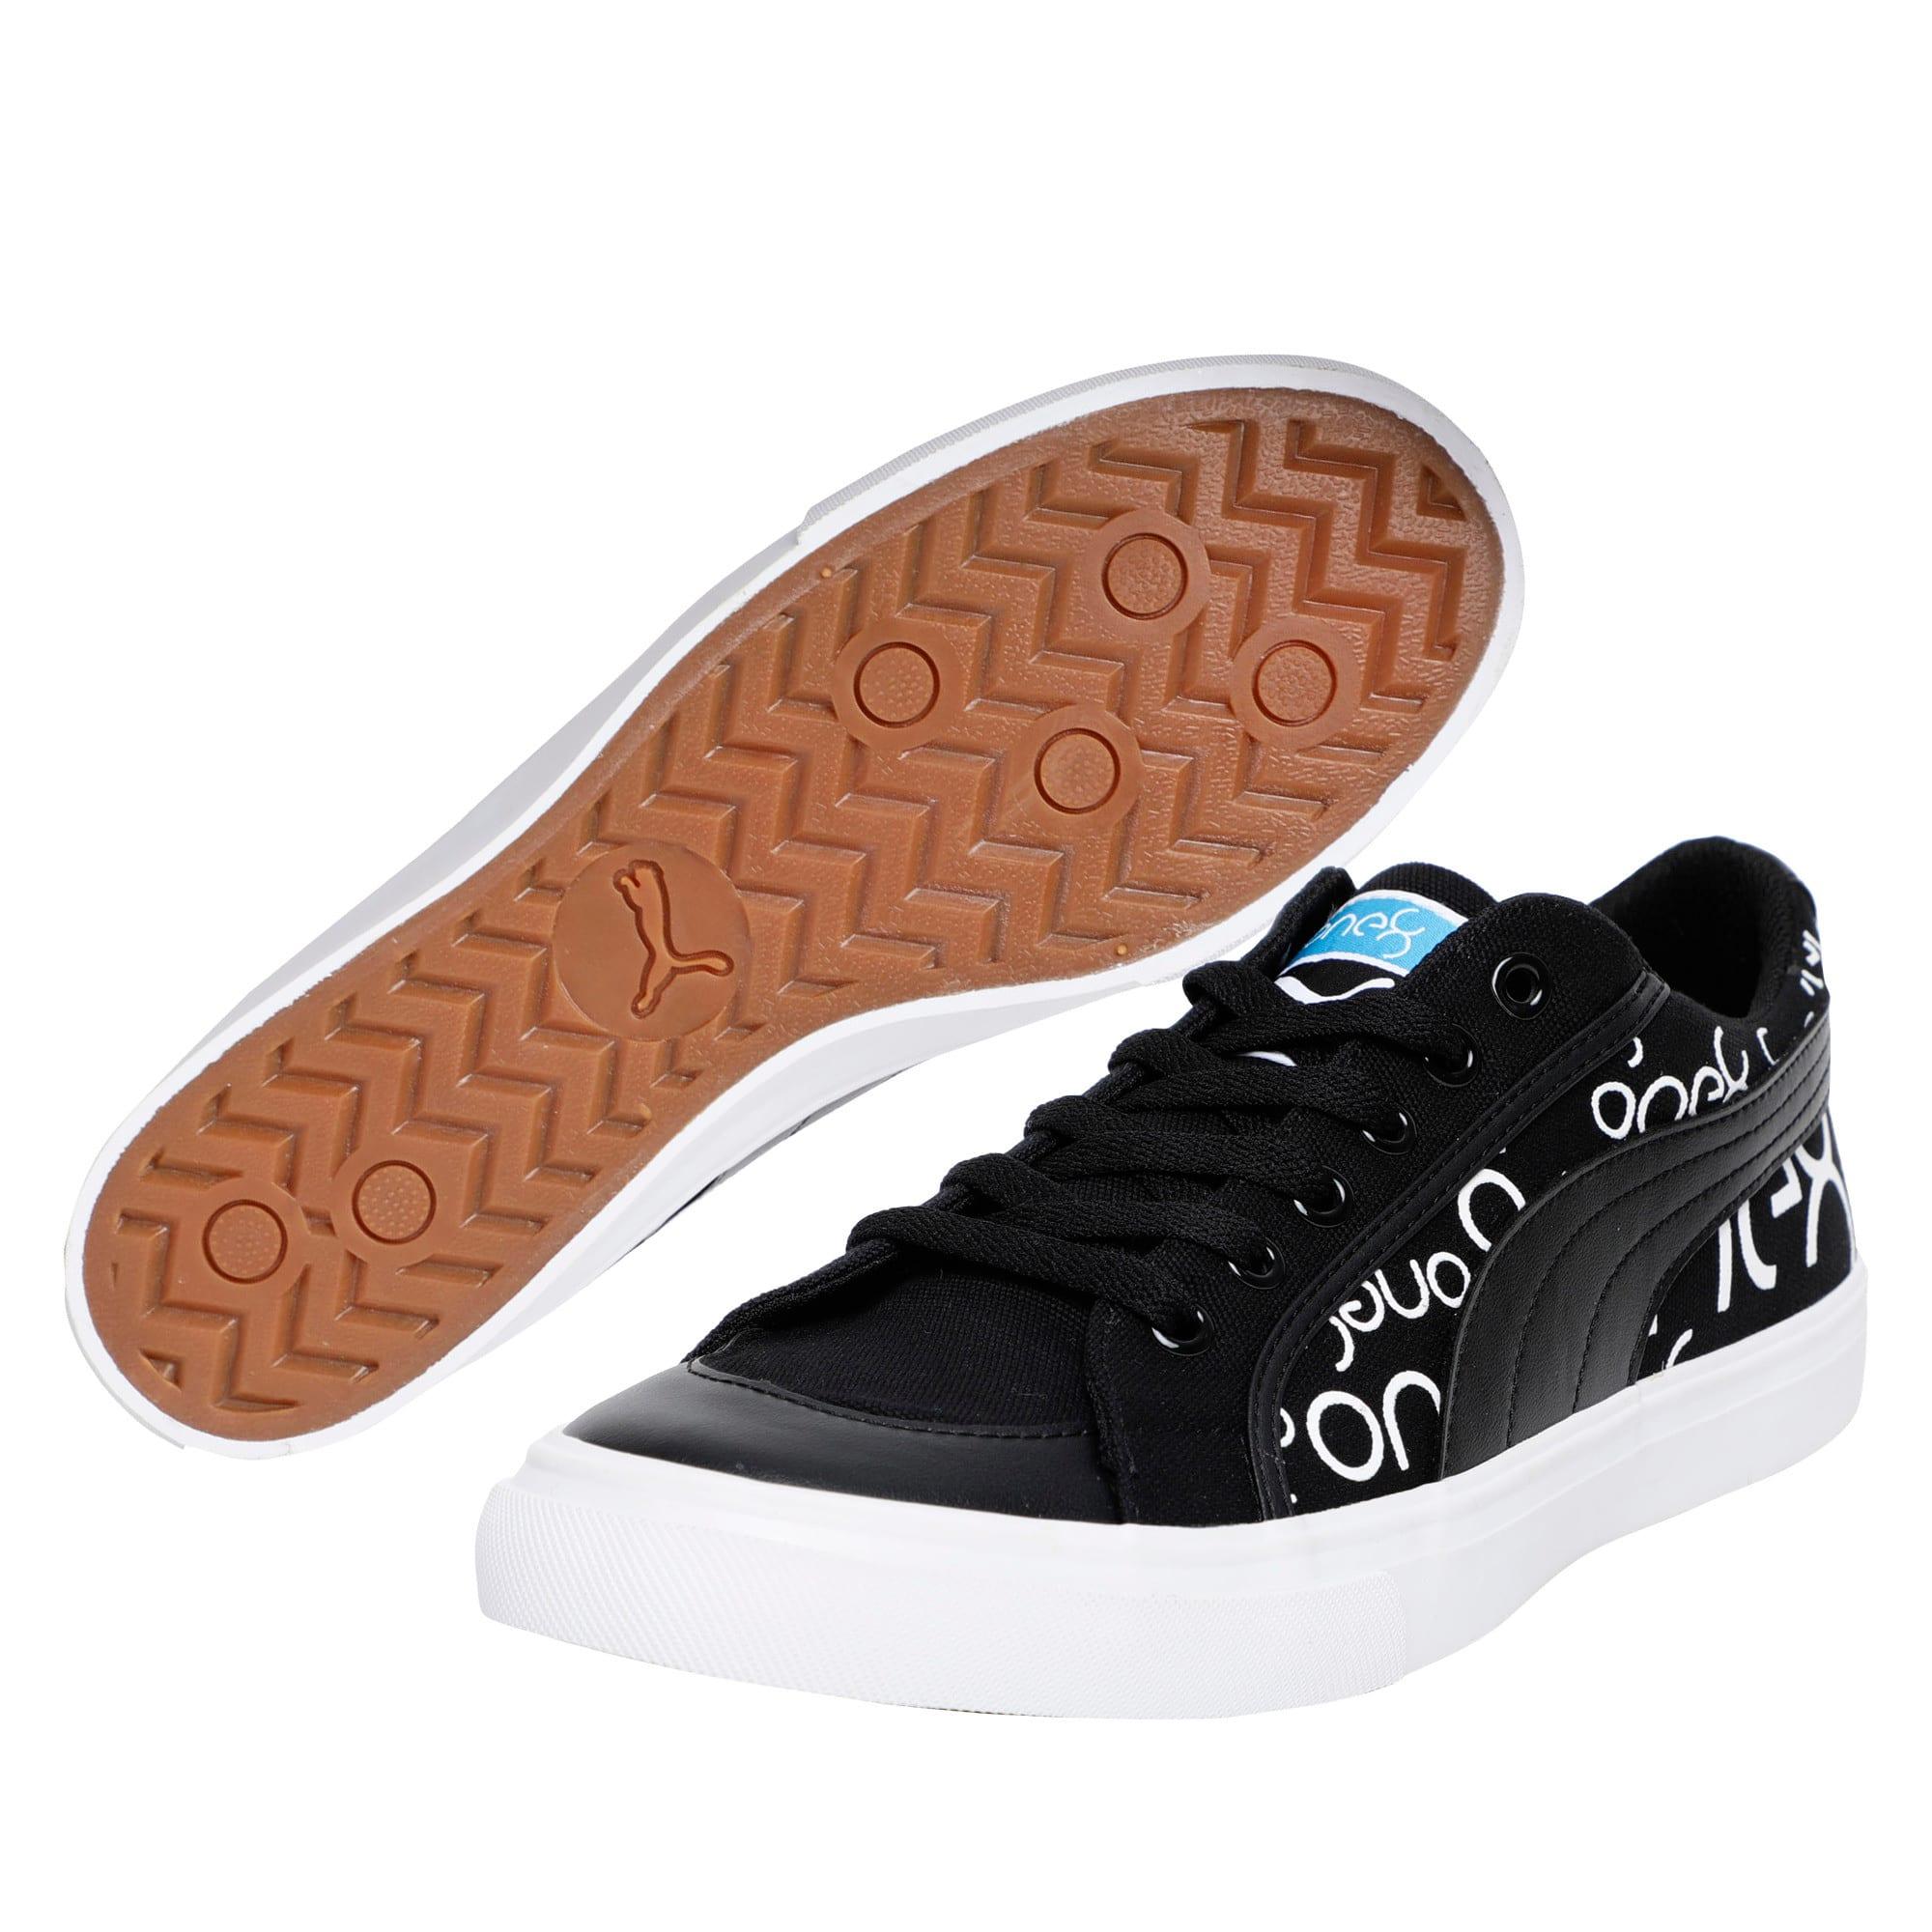 Thumbnail 2 of one8 Men's Sneakers, Black-White-Pomegranate, medium-IND